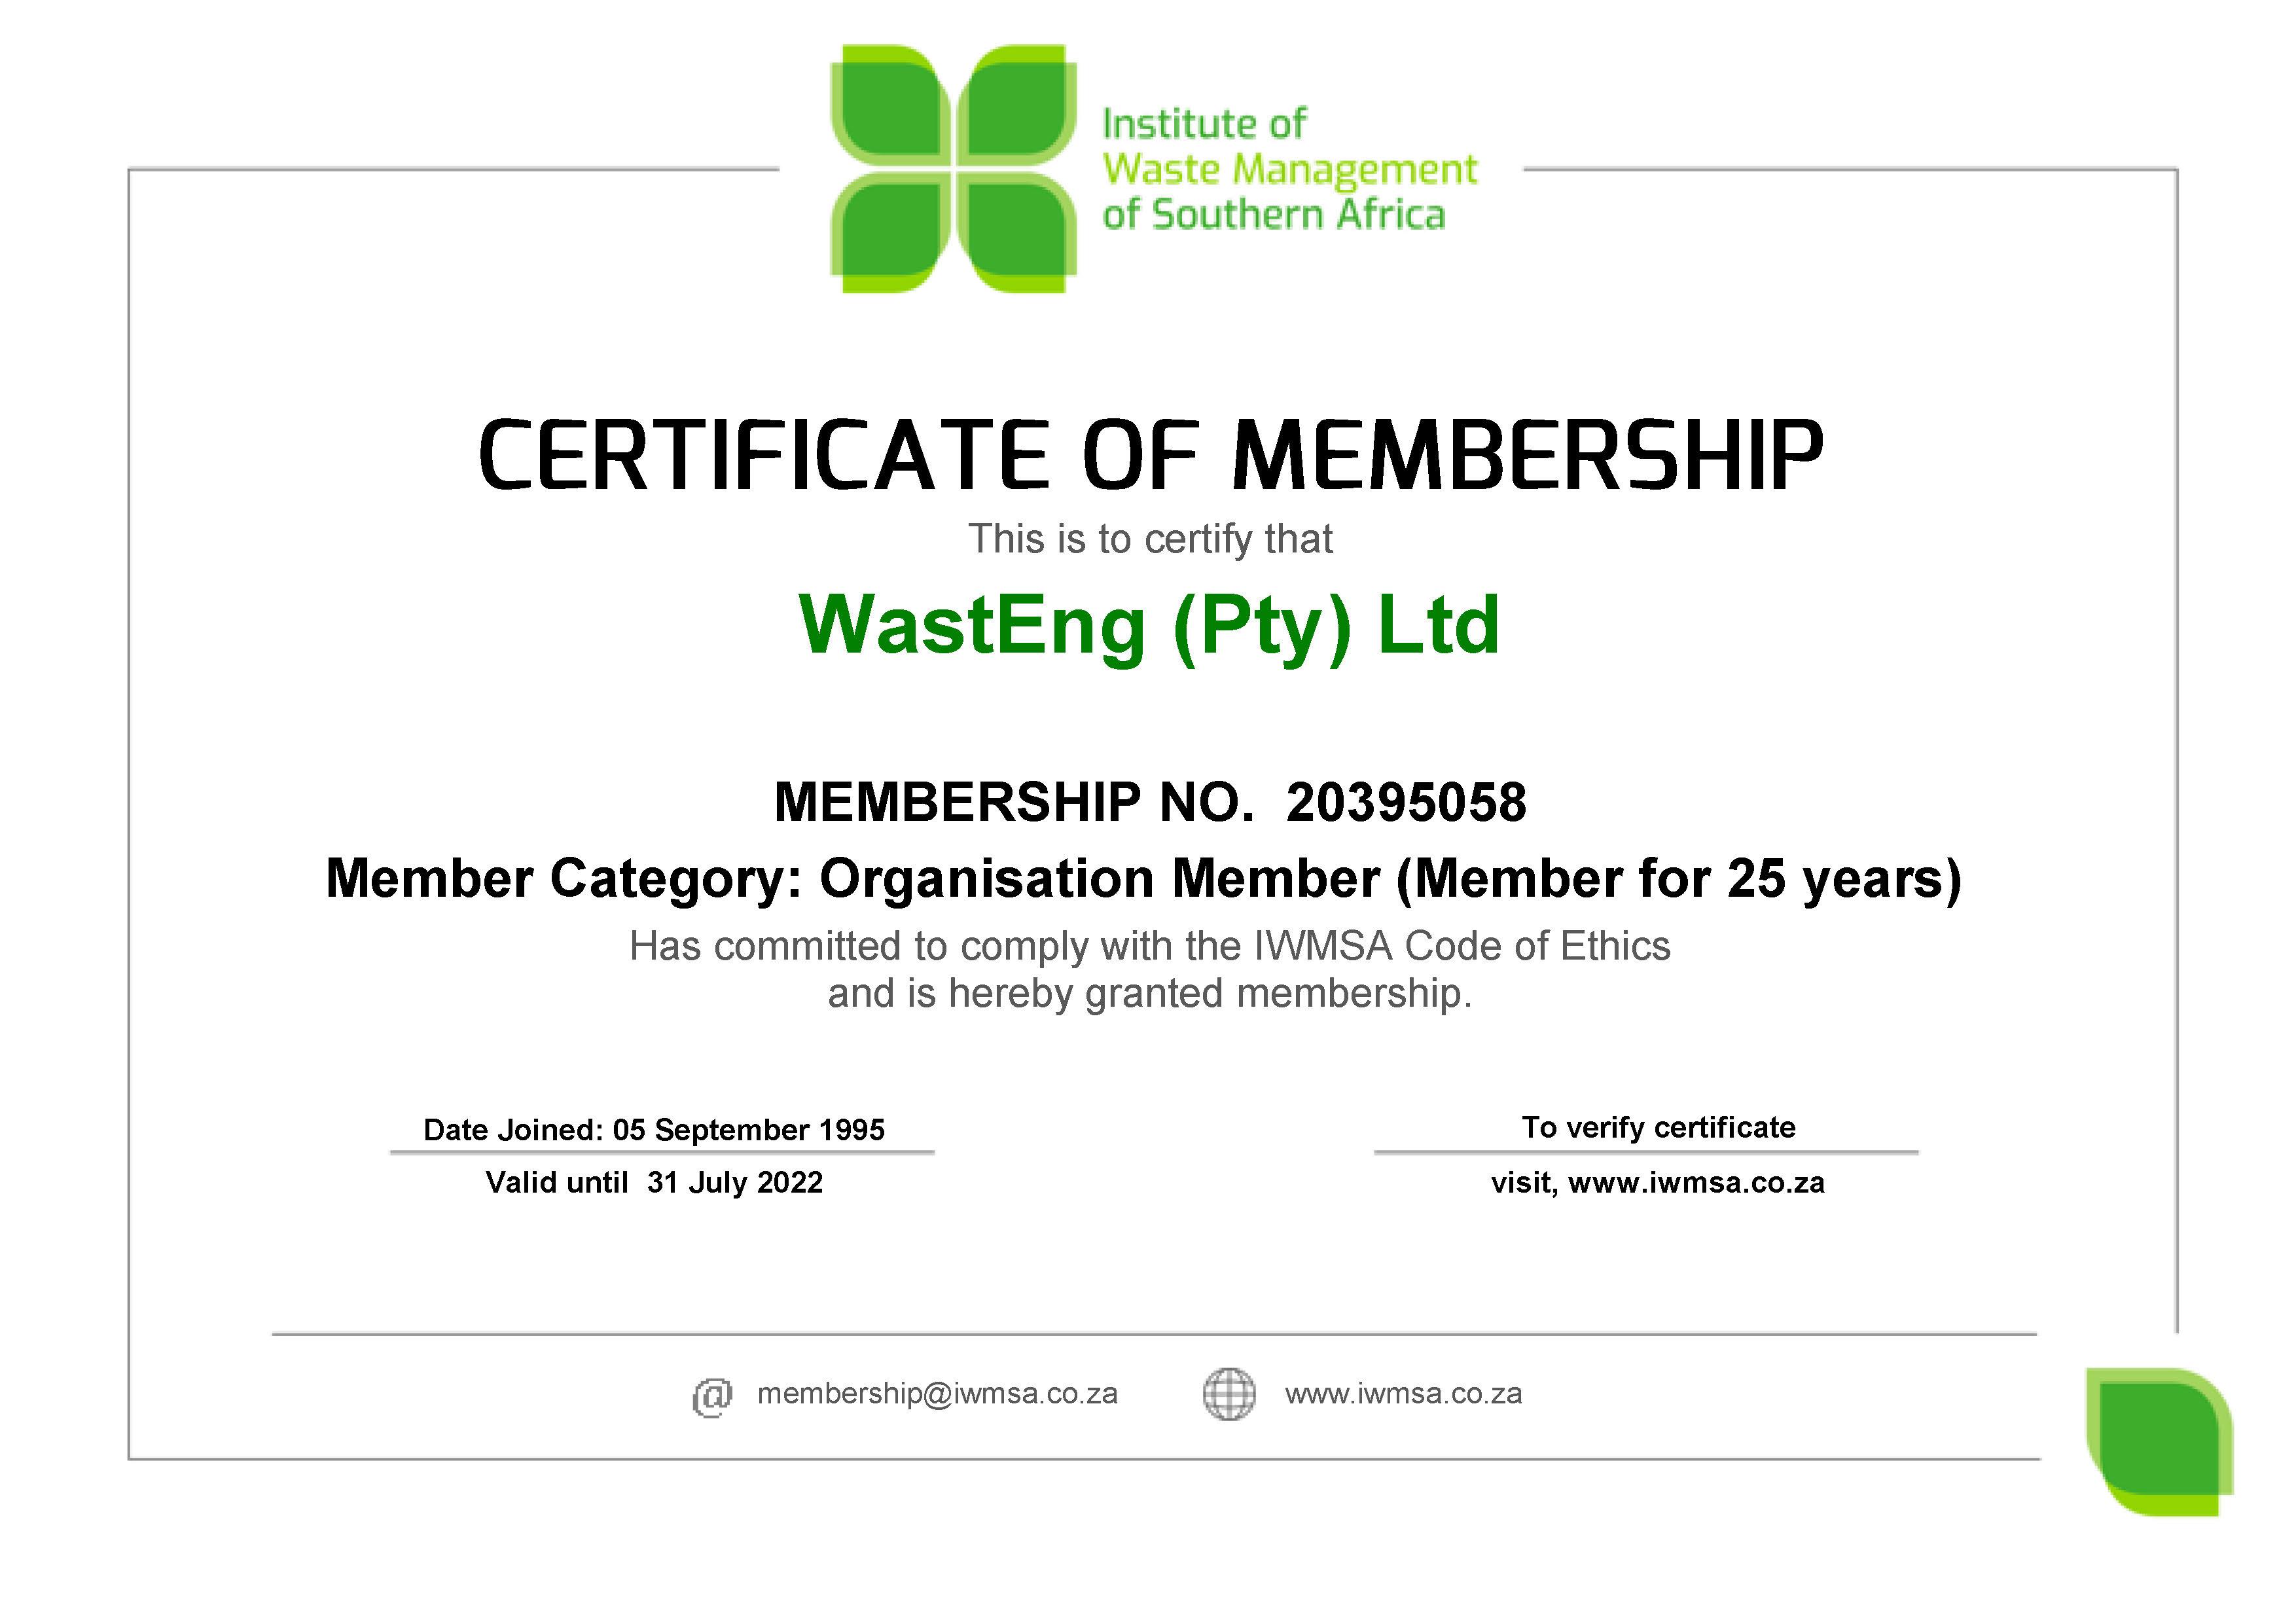 WastEng (Pty) Ltd (20395058) MembershipCertificate